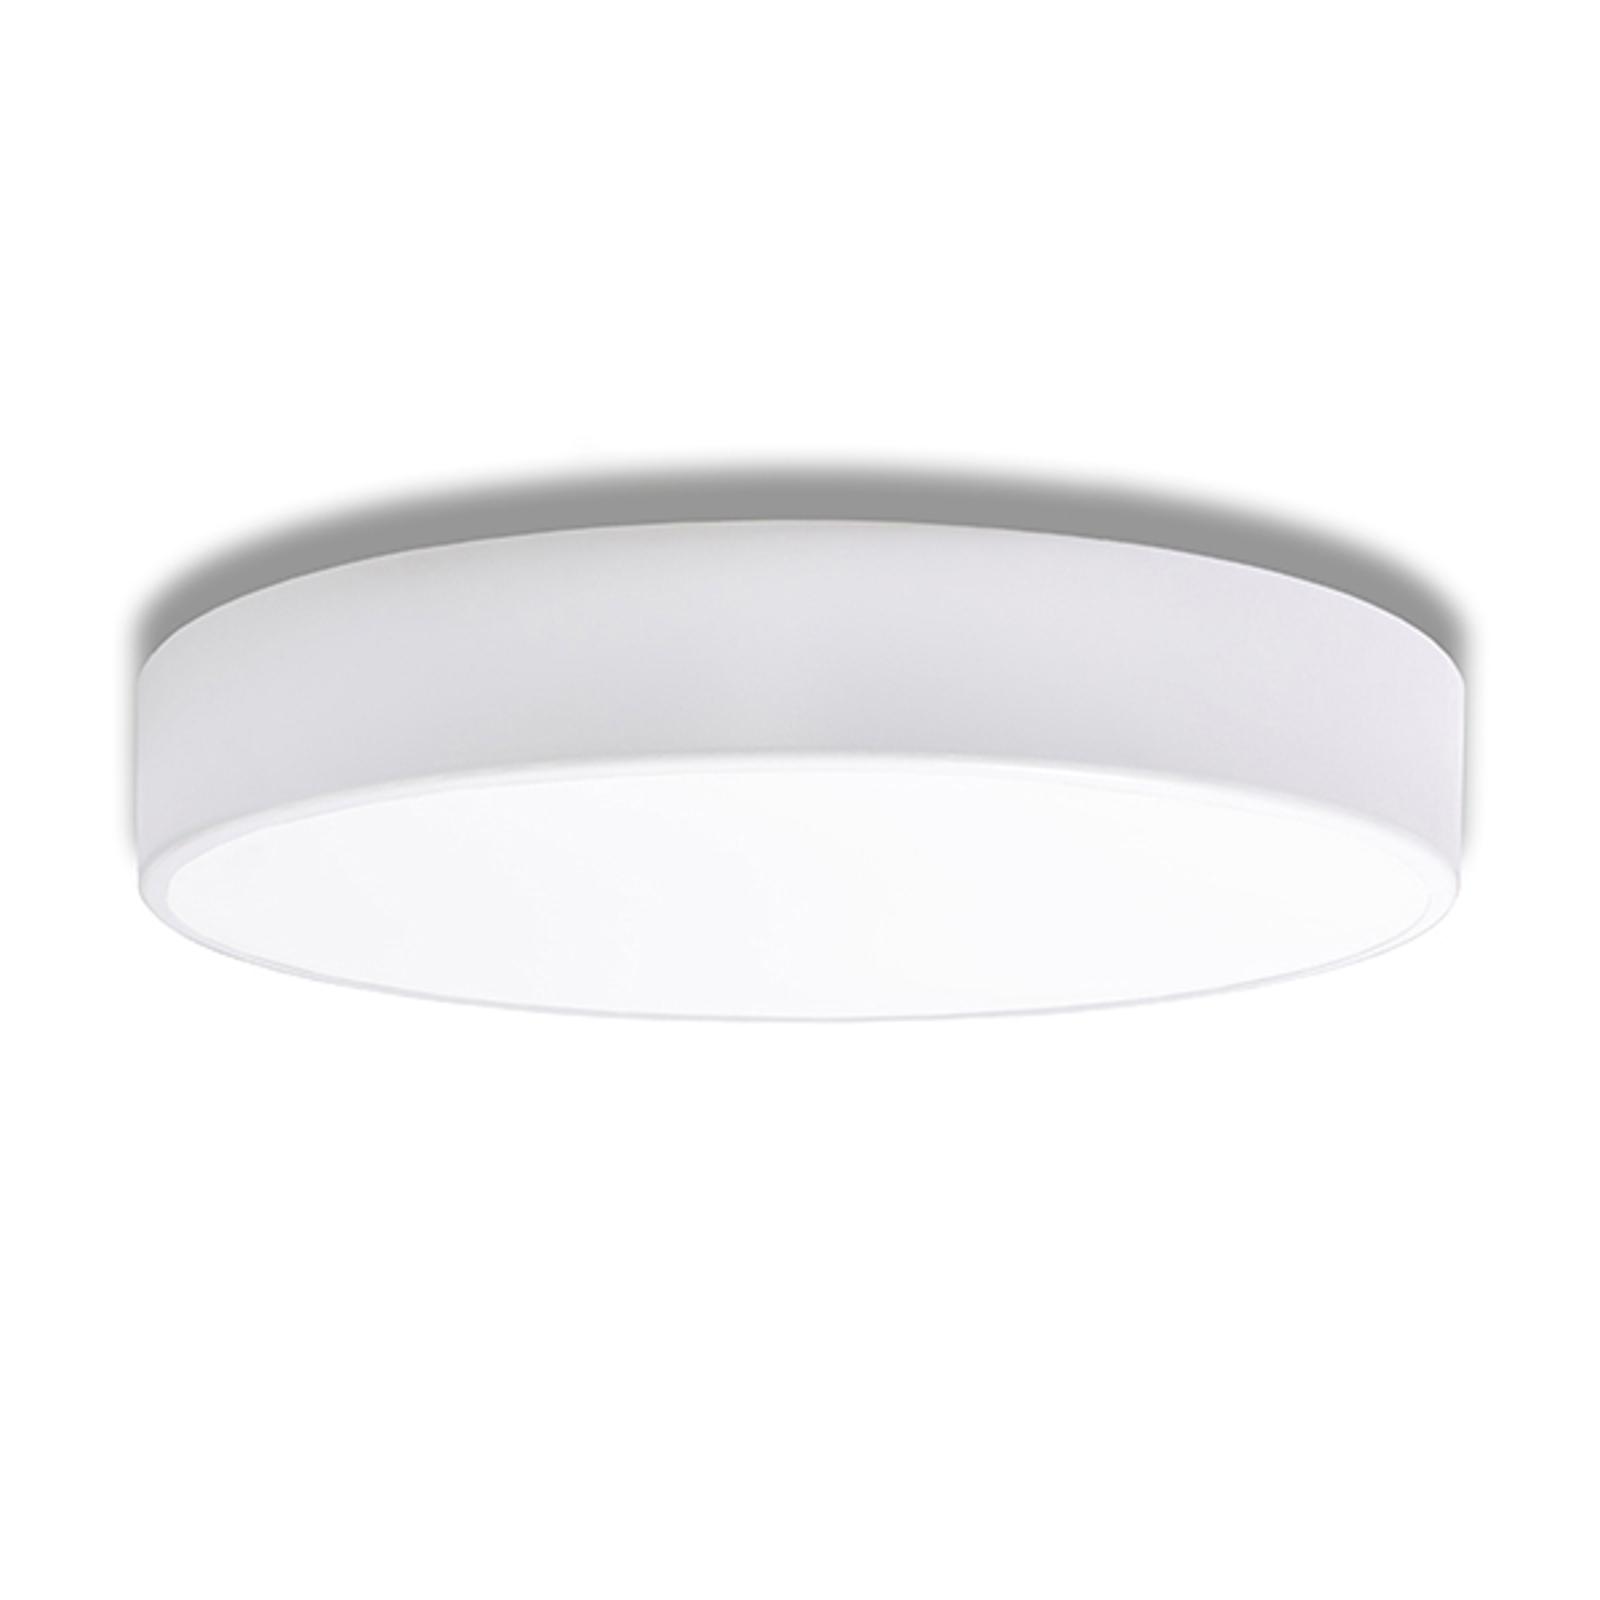 Cleo loftlampe, Ø 50 cm, hvid